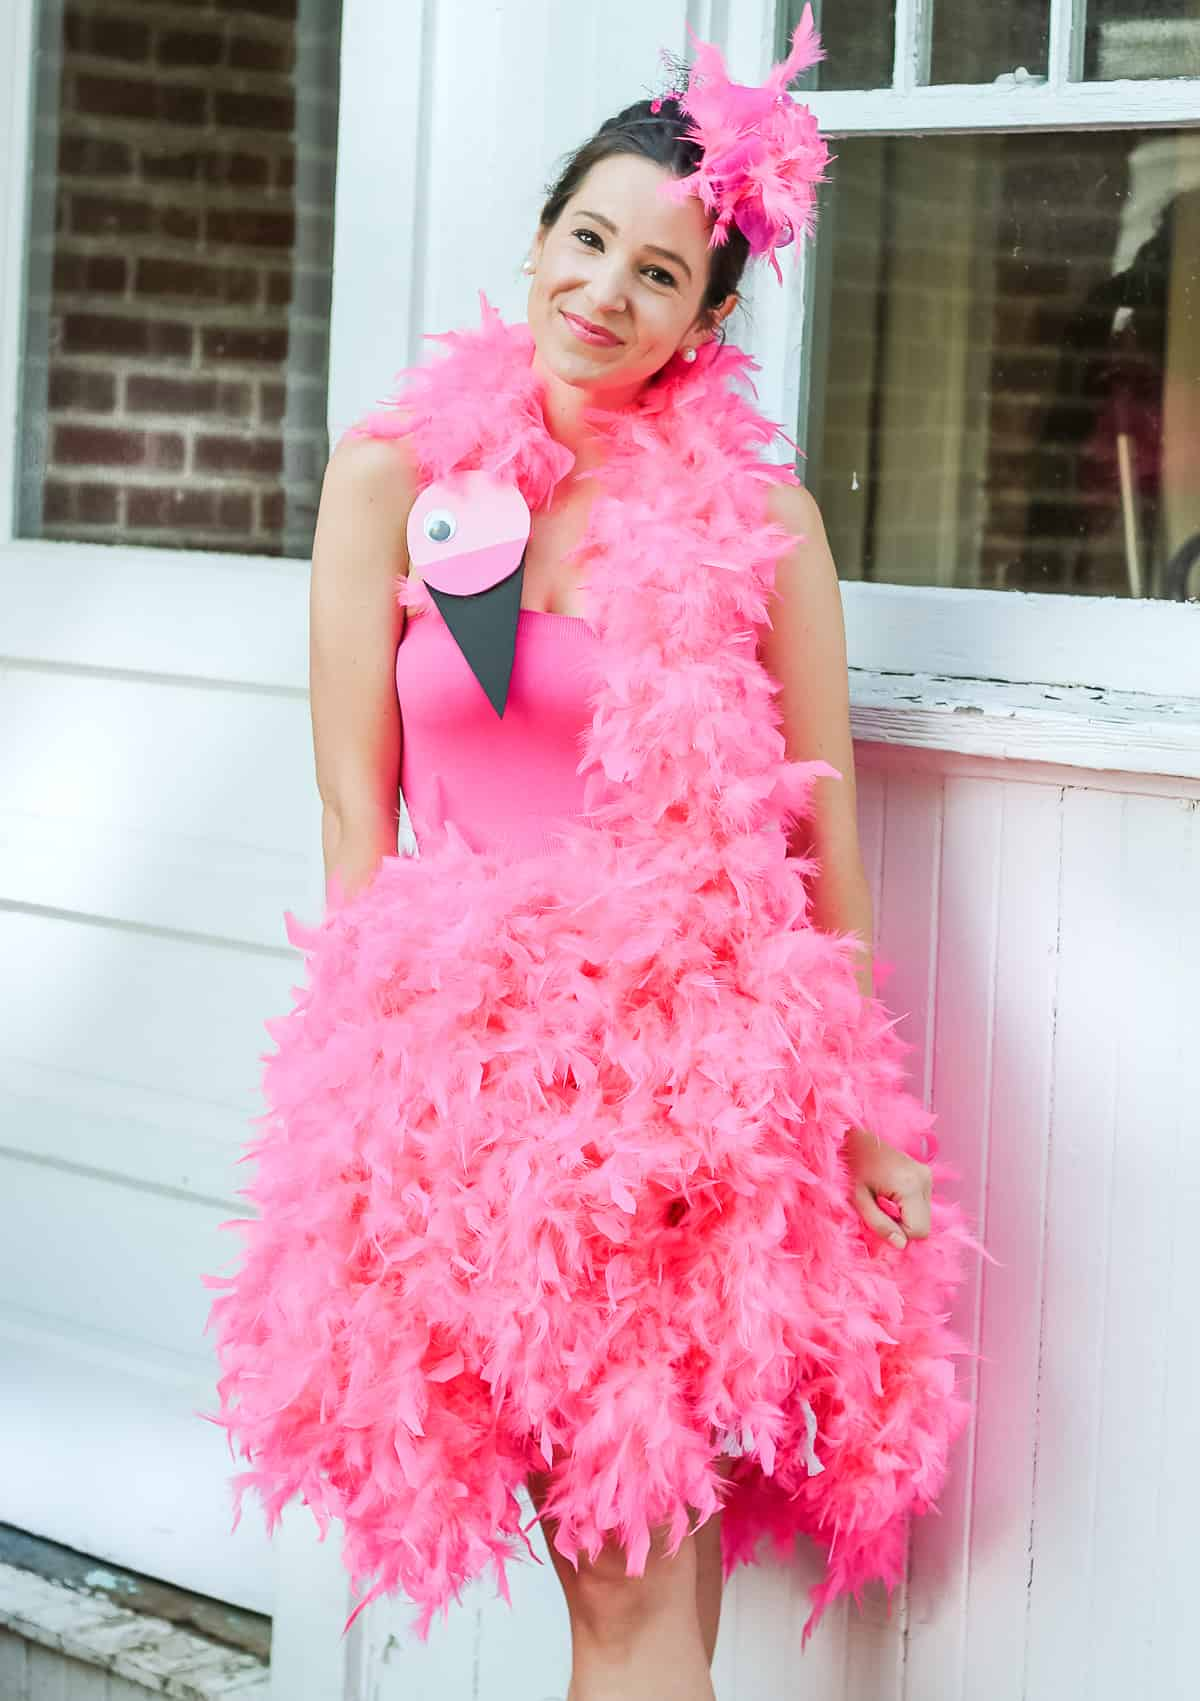 Family Halloween Costume Ideas - Be a Flamingo Family